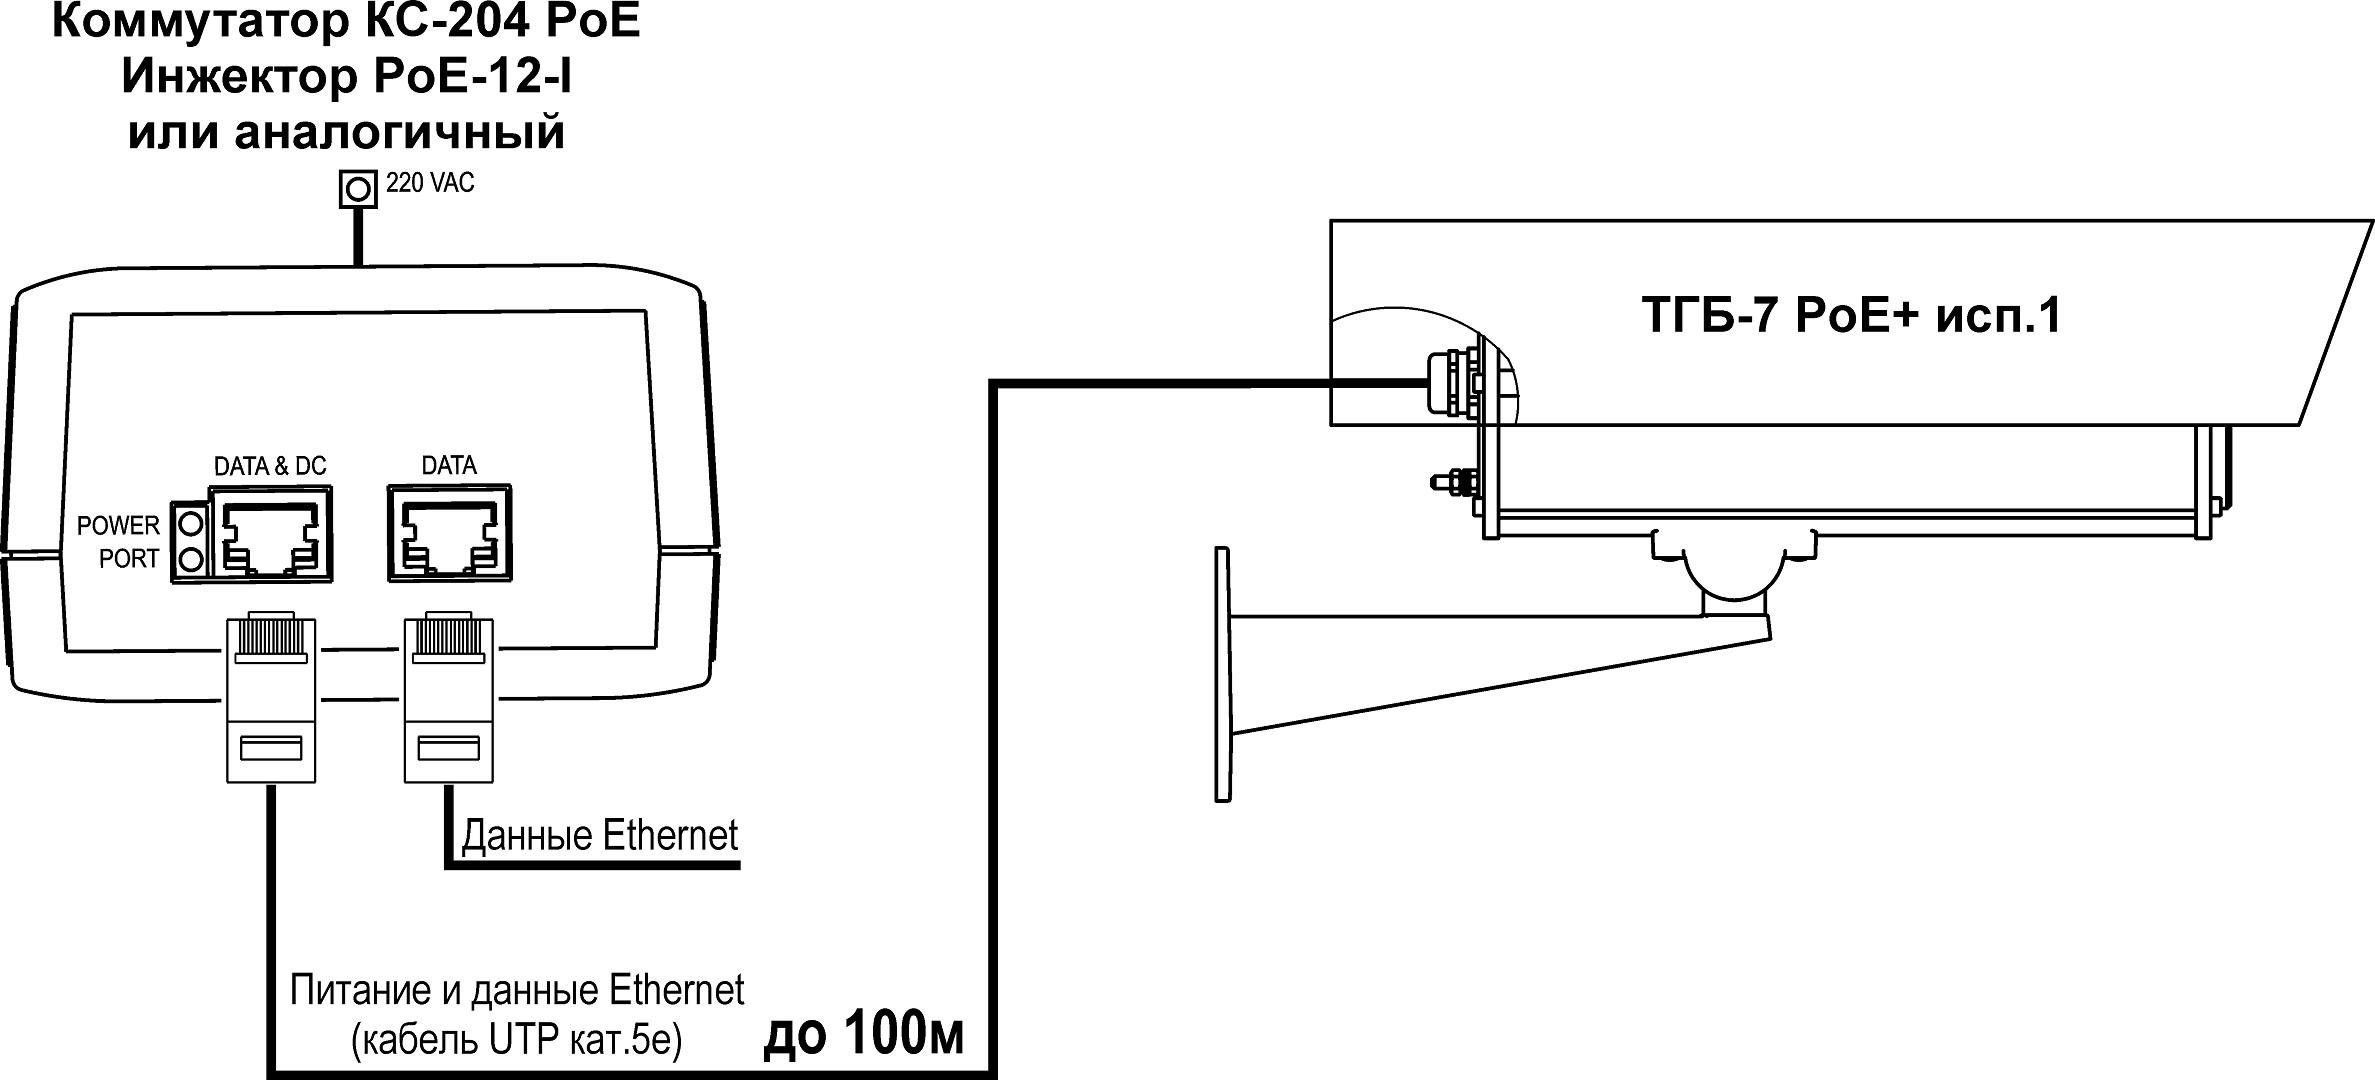 Пример подключения гермобокса ТГБ-7 PoE исп1